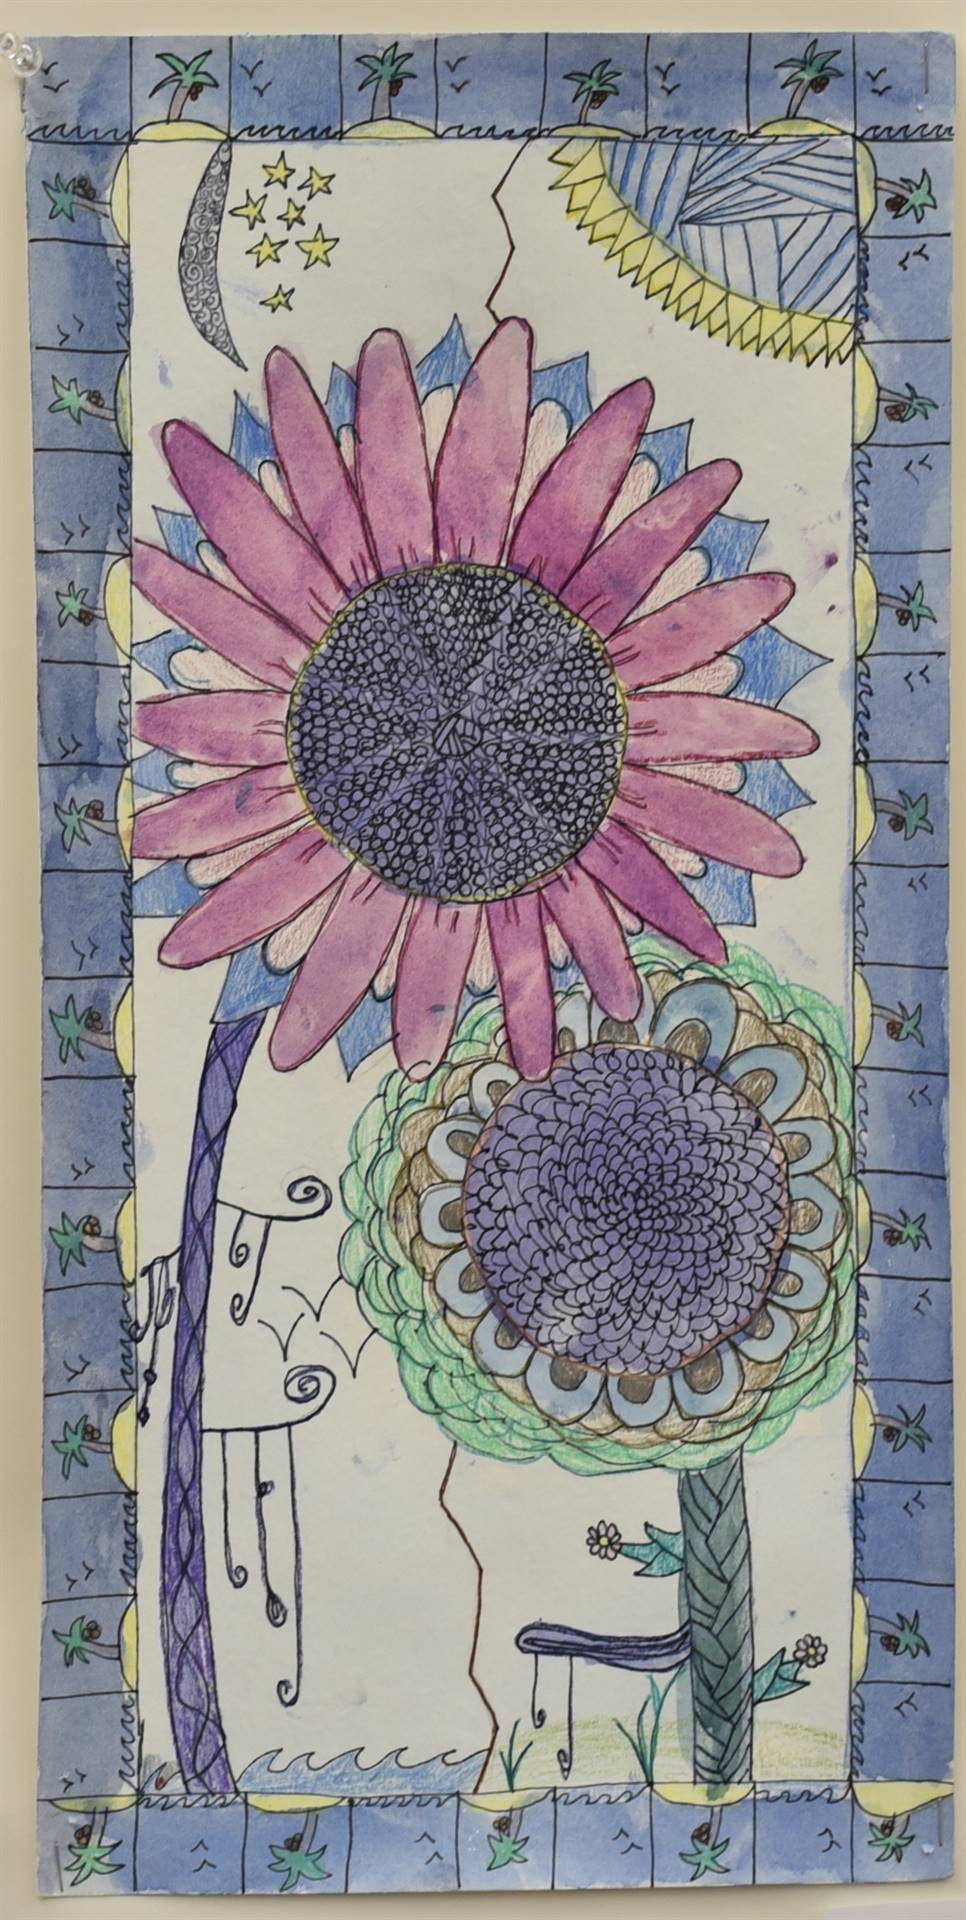 Brecksville-Broadview Hts. Middle School Art Projects 167